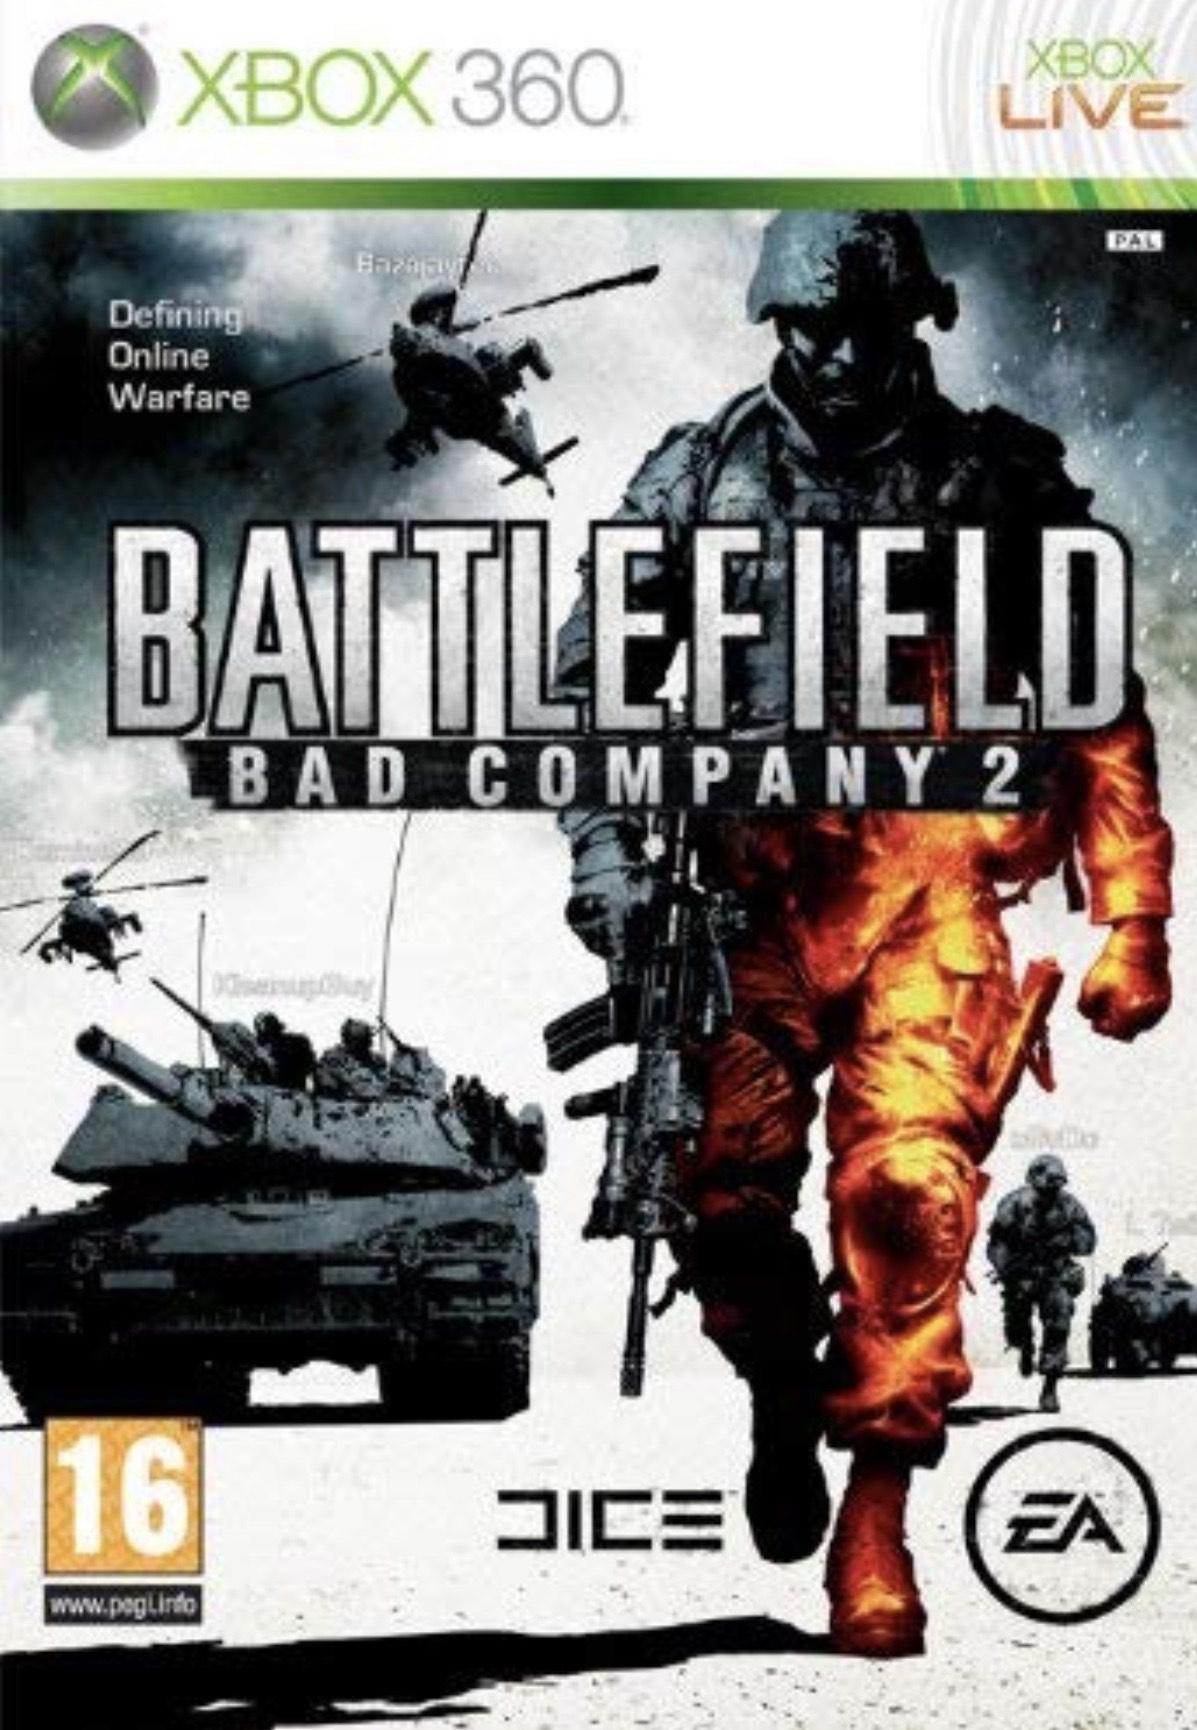 Battlefield: Bad company 2 // Battlefield 3 (Xbox 360/Xbox One) £3.74 with gold @ Microsoft store